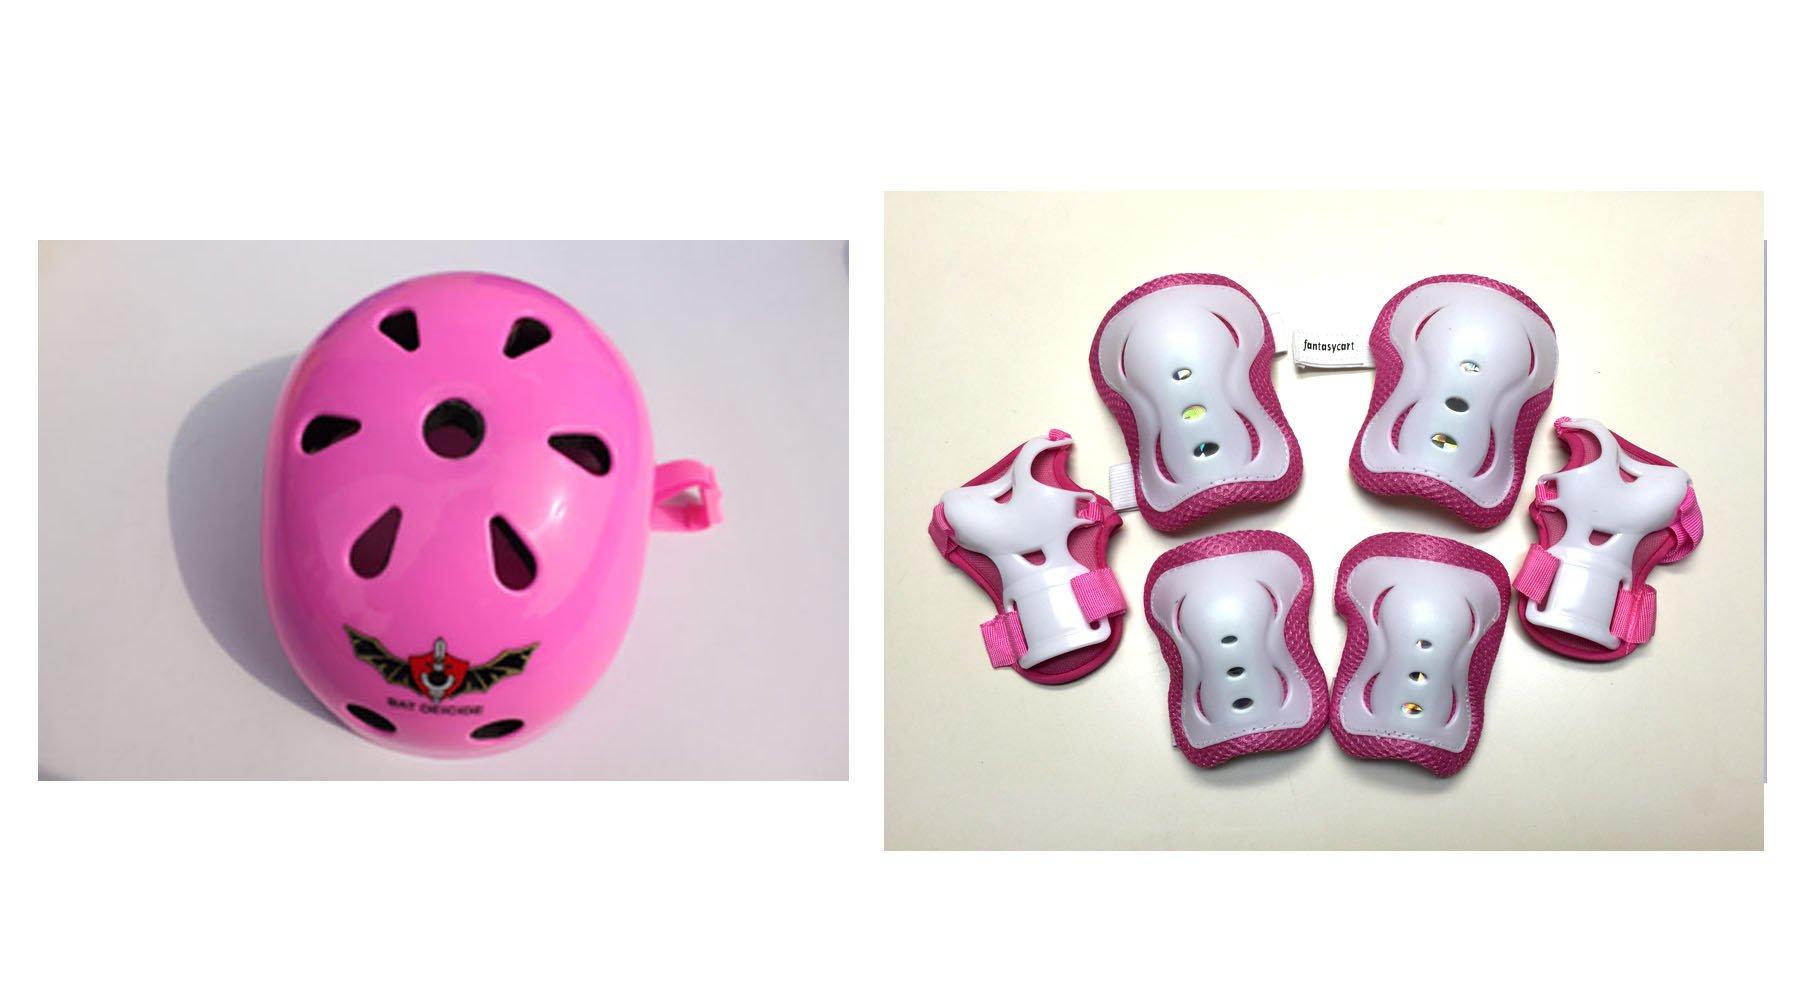 Fantasycart Kid's Skateboard Longboard Helmet Knee & Elbow Pads Wrist Guard Combo Pink Set 2-8 years old